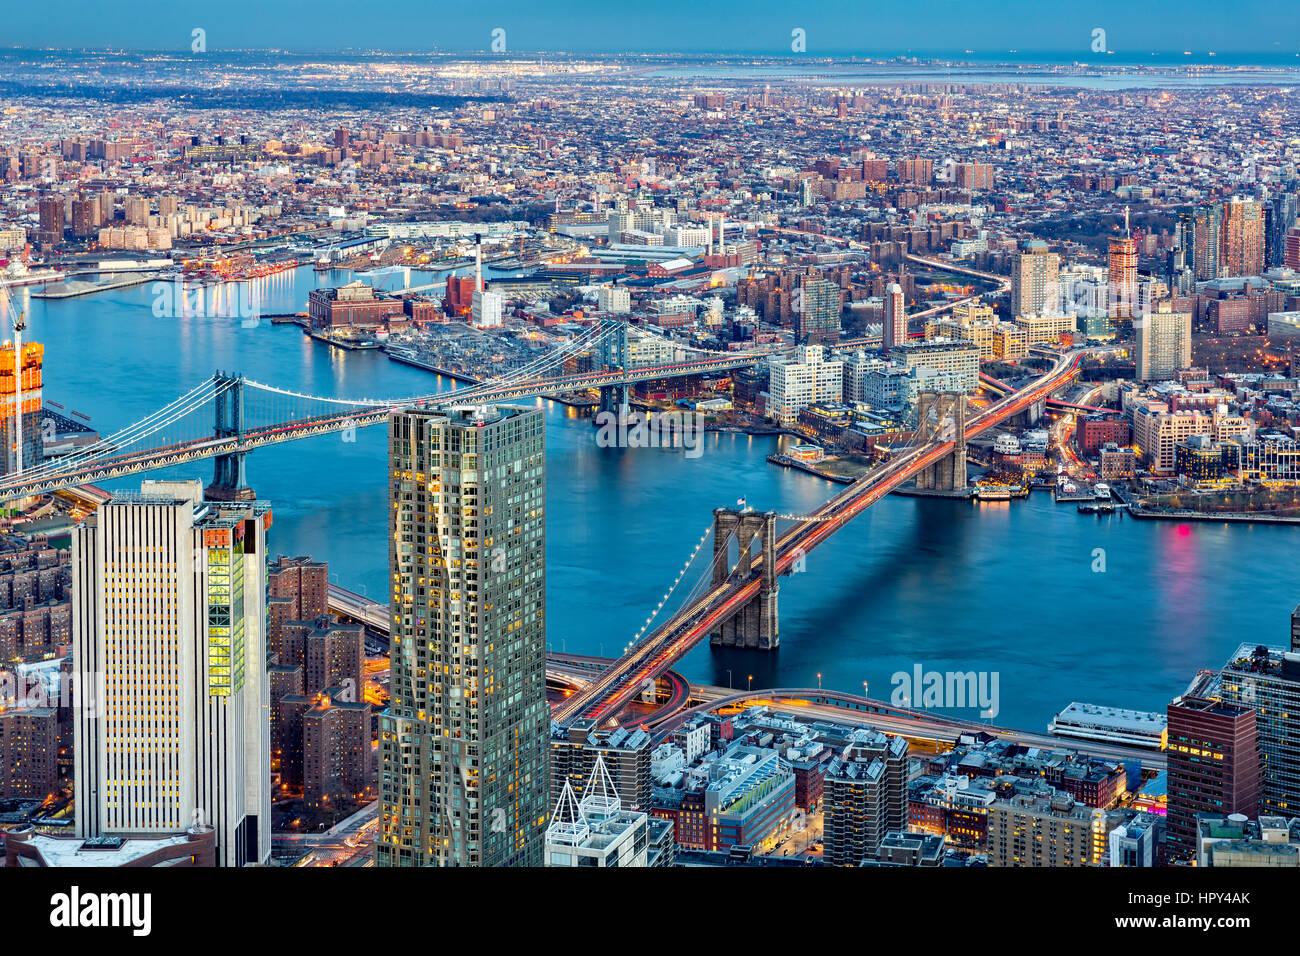 Brooklyn e ponti di Manhattan span East River al crepuscolo, tra l'isola di Manhattan e Brooklyn borough Immagini Stock